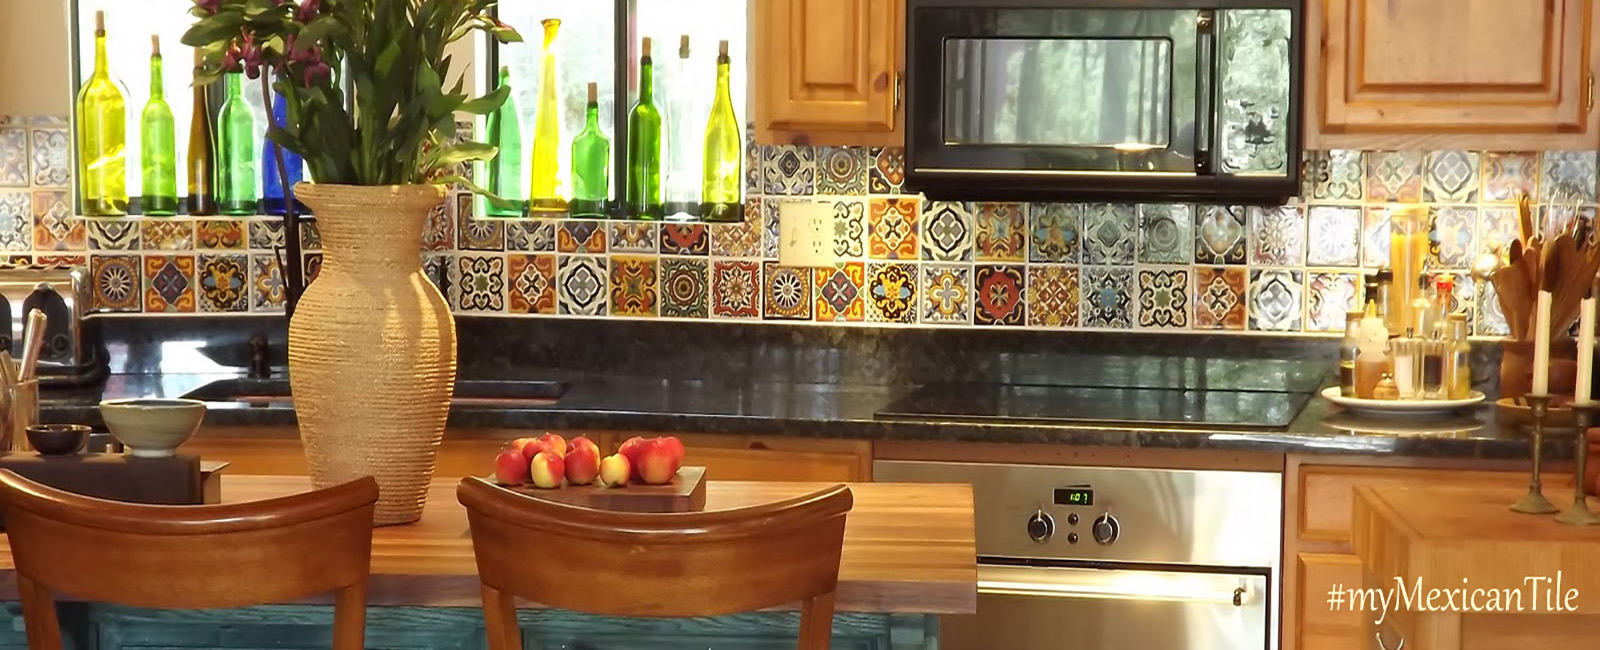 Mexican Tiles for Kitchen Wall Backsplash  Bathroom